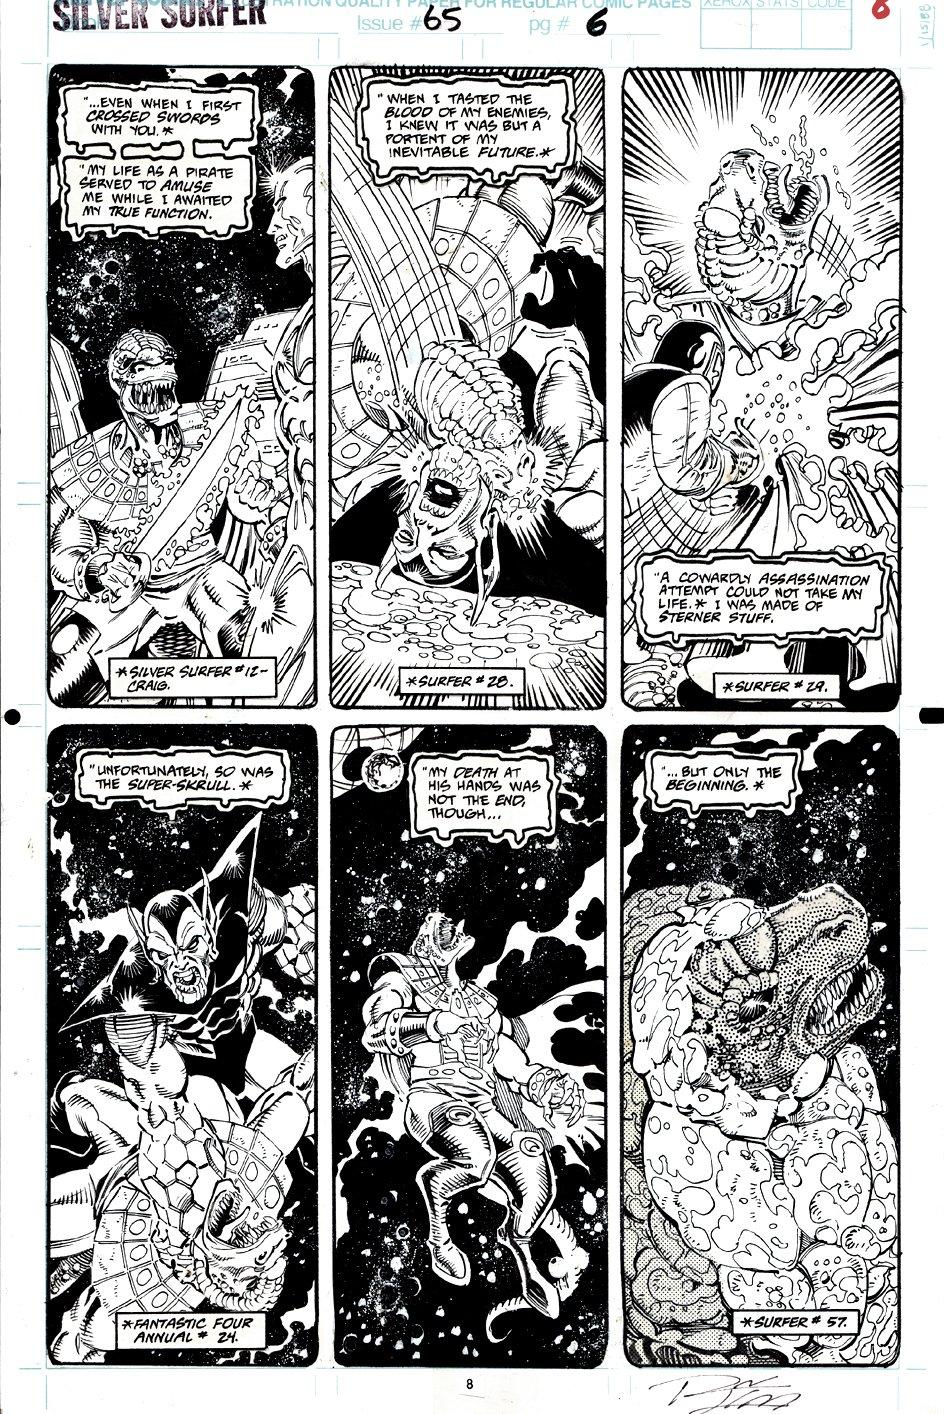 Silver Surfer #65 p 6 (Silver Surfer, Reptyl, Super Skrull!) 1992